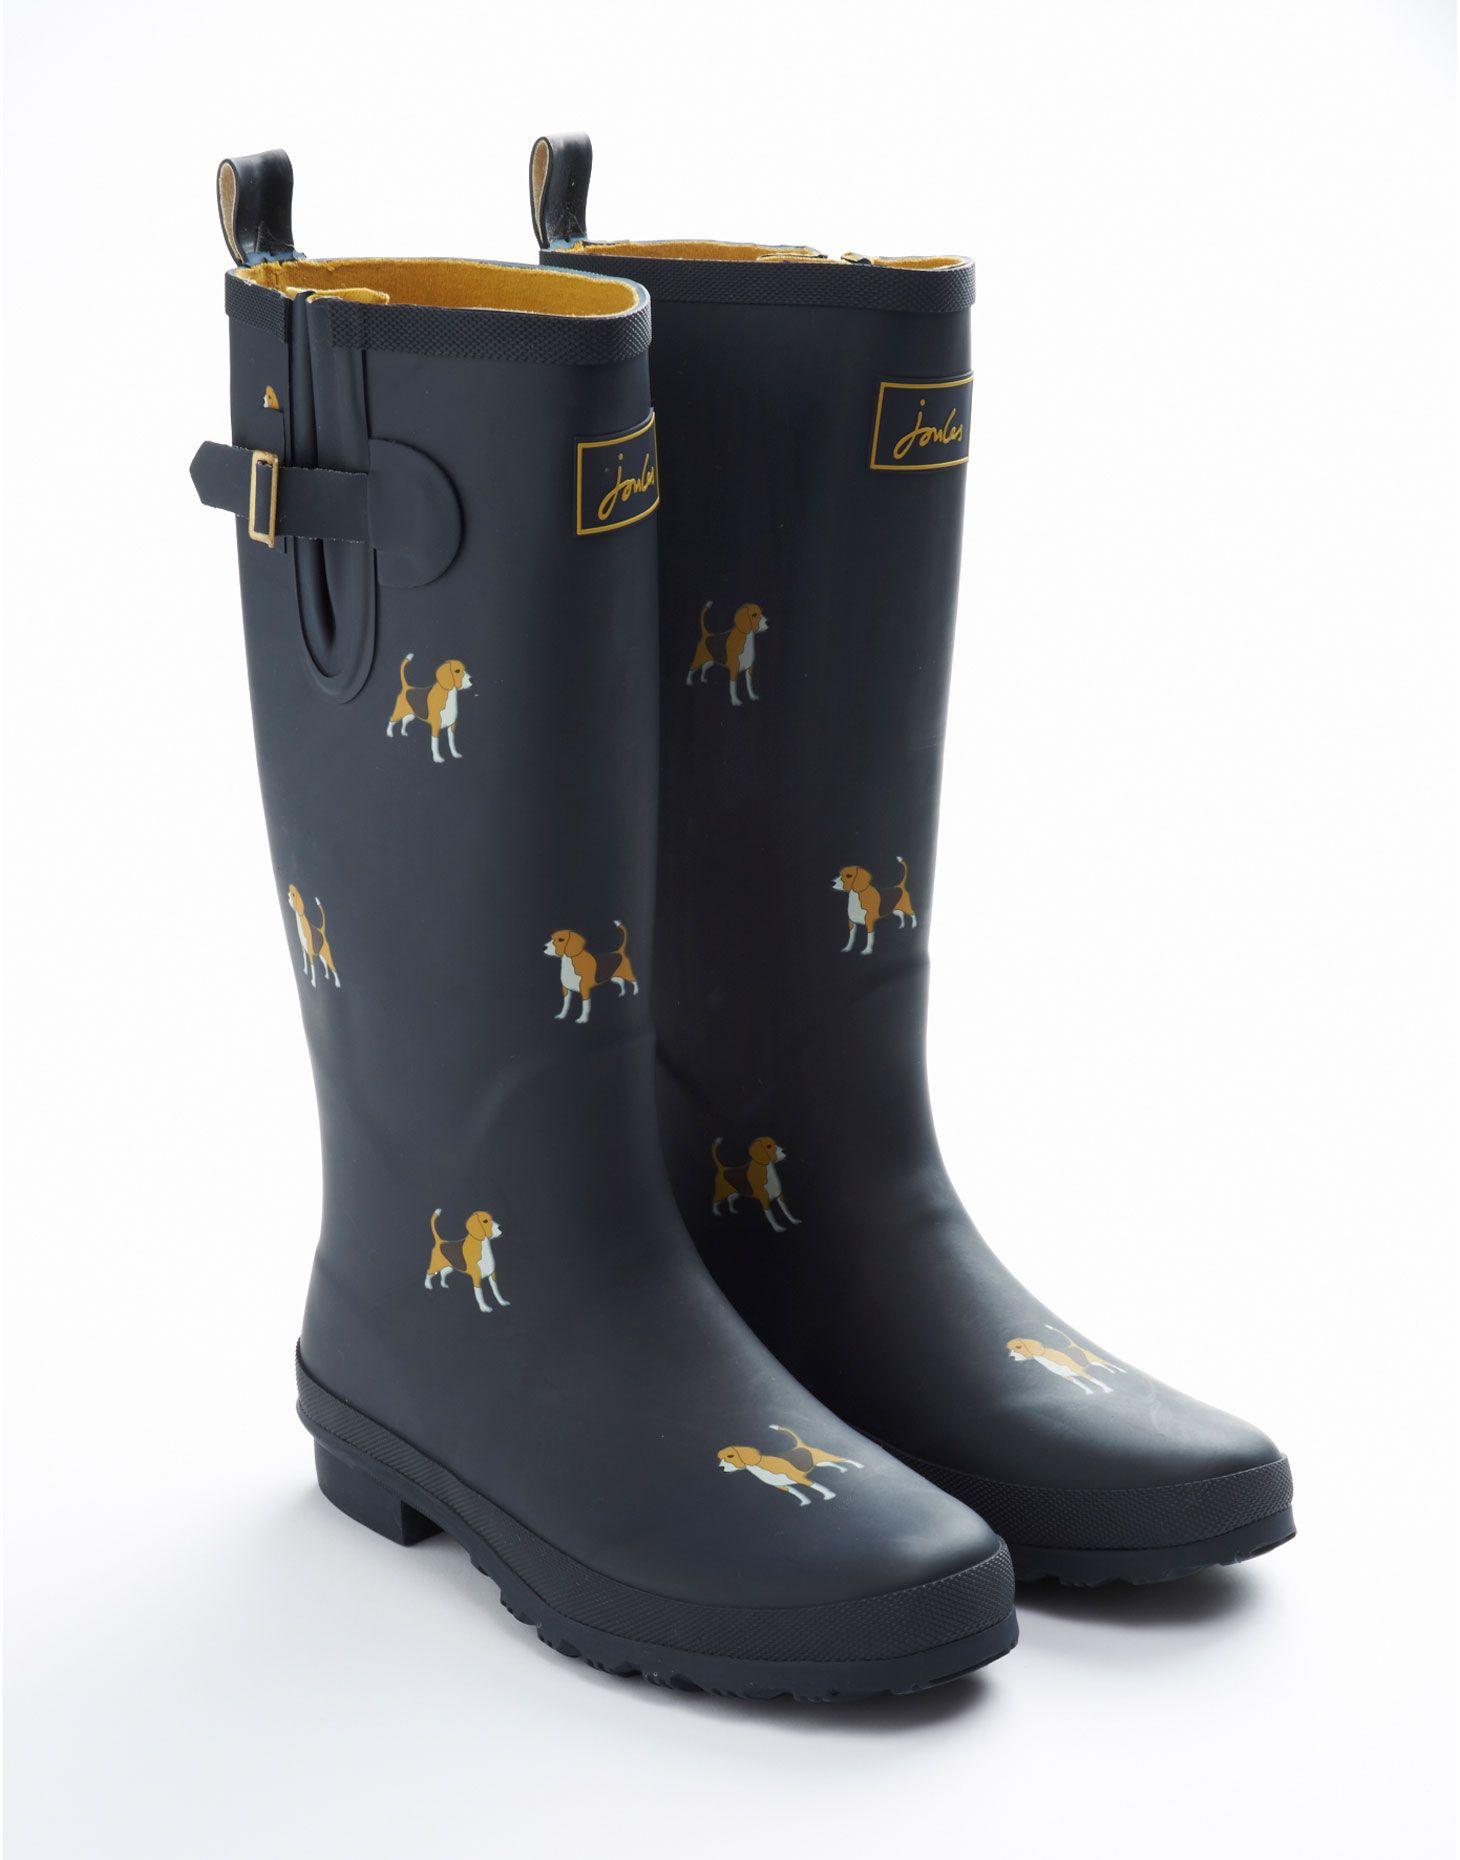 WELLY PRINT Womens Printed Rain Boots